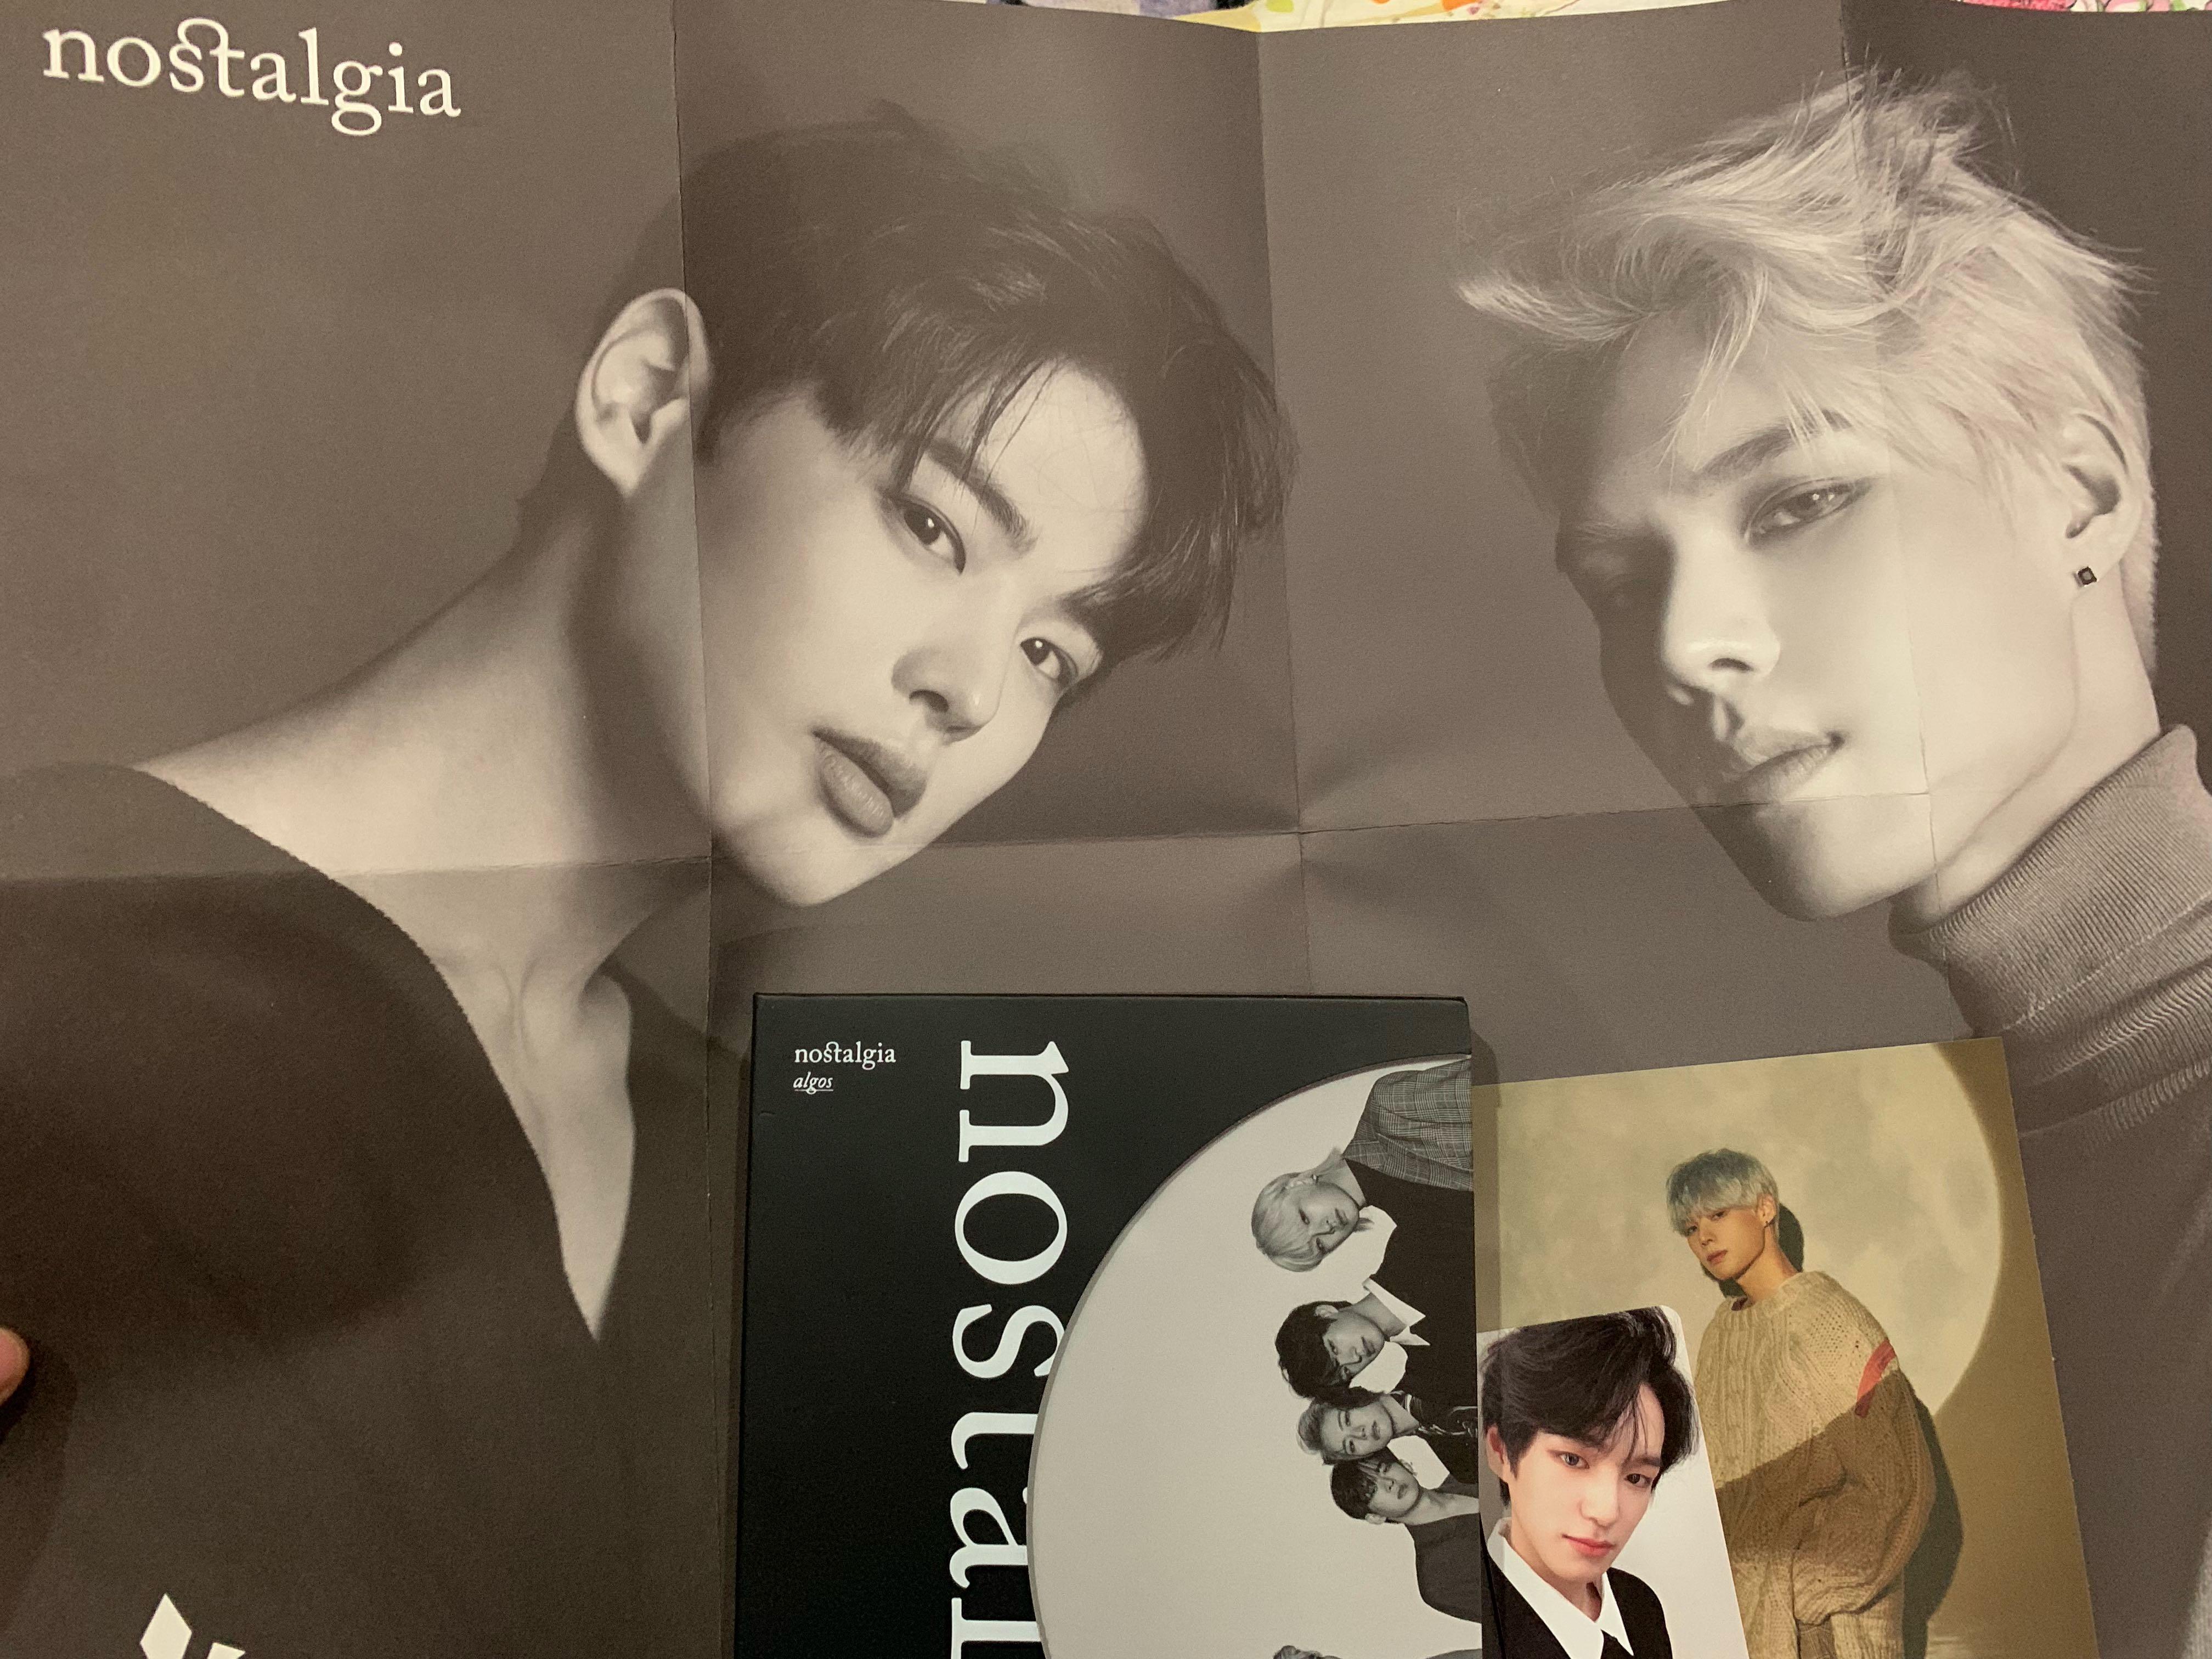 Victon Nostalgia Algos ver Byungchan Sejun Poster Sejun Postcard Chan PC